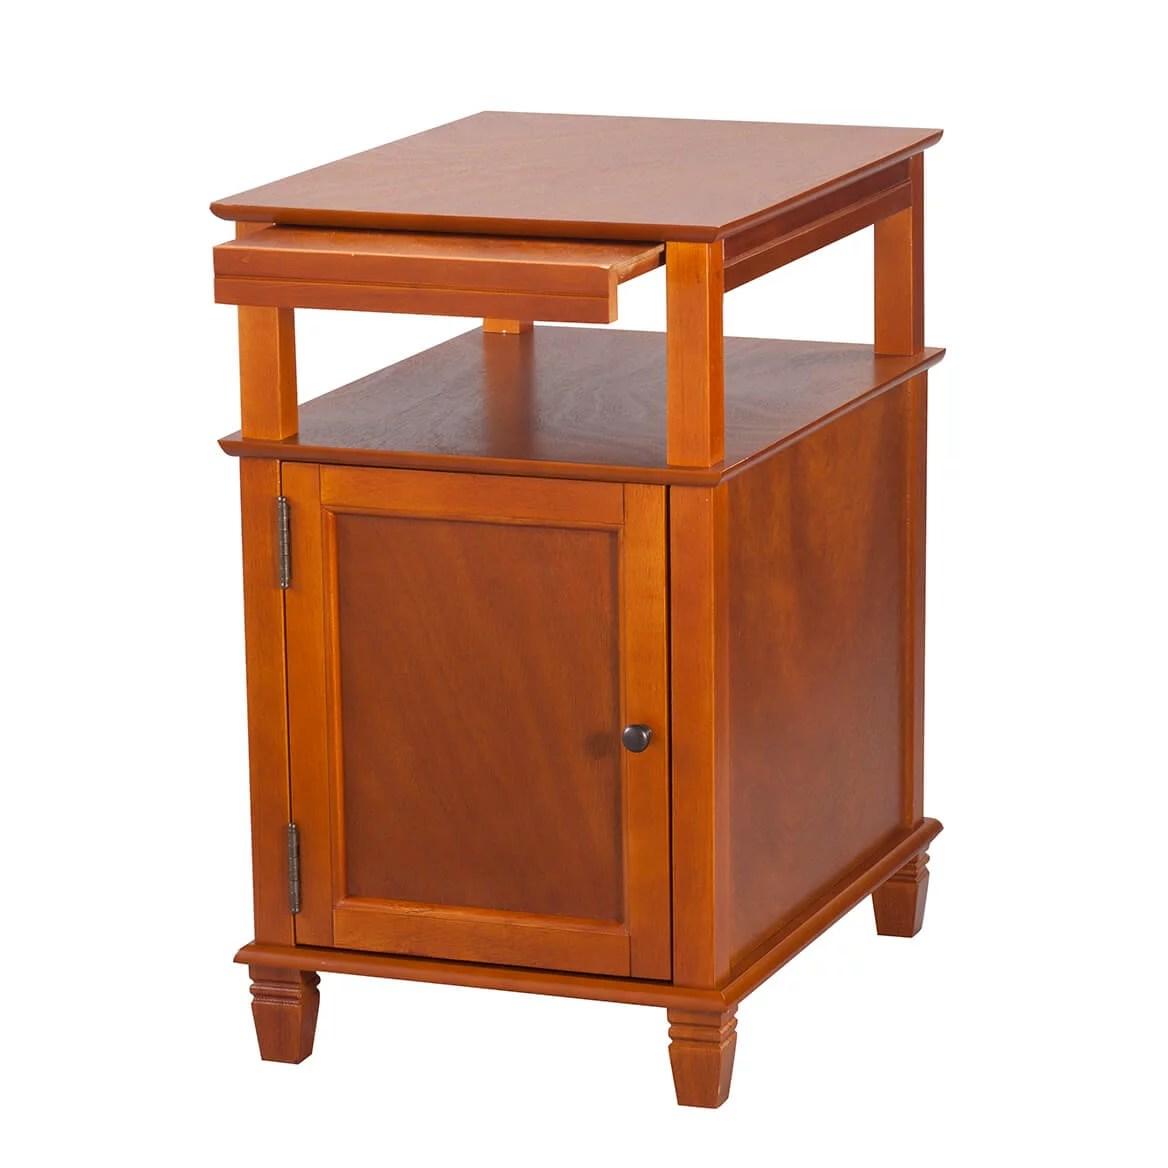 miles kimball appleton recliner table by oakridge with slide out shelf honey